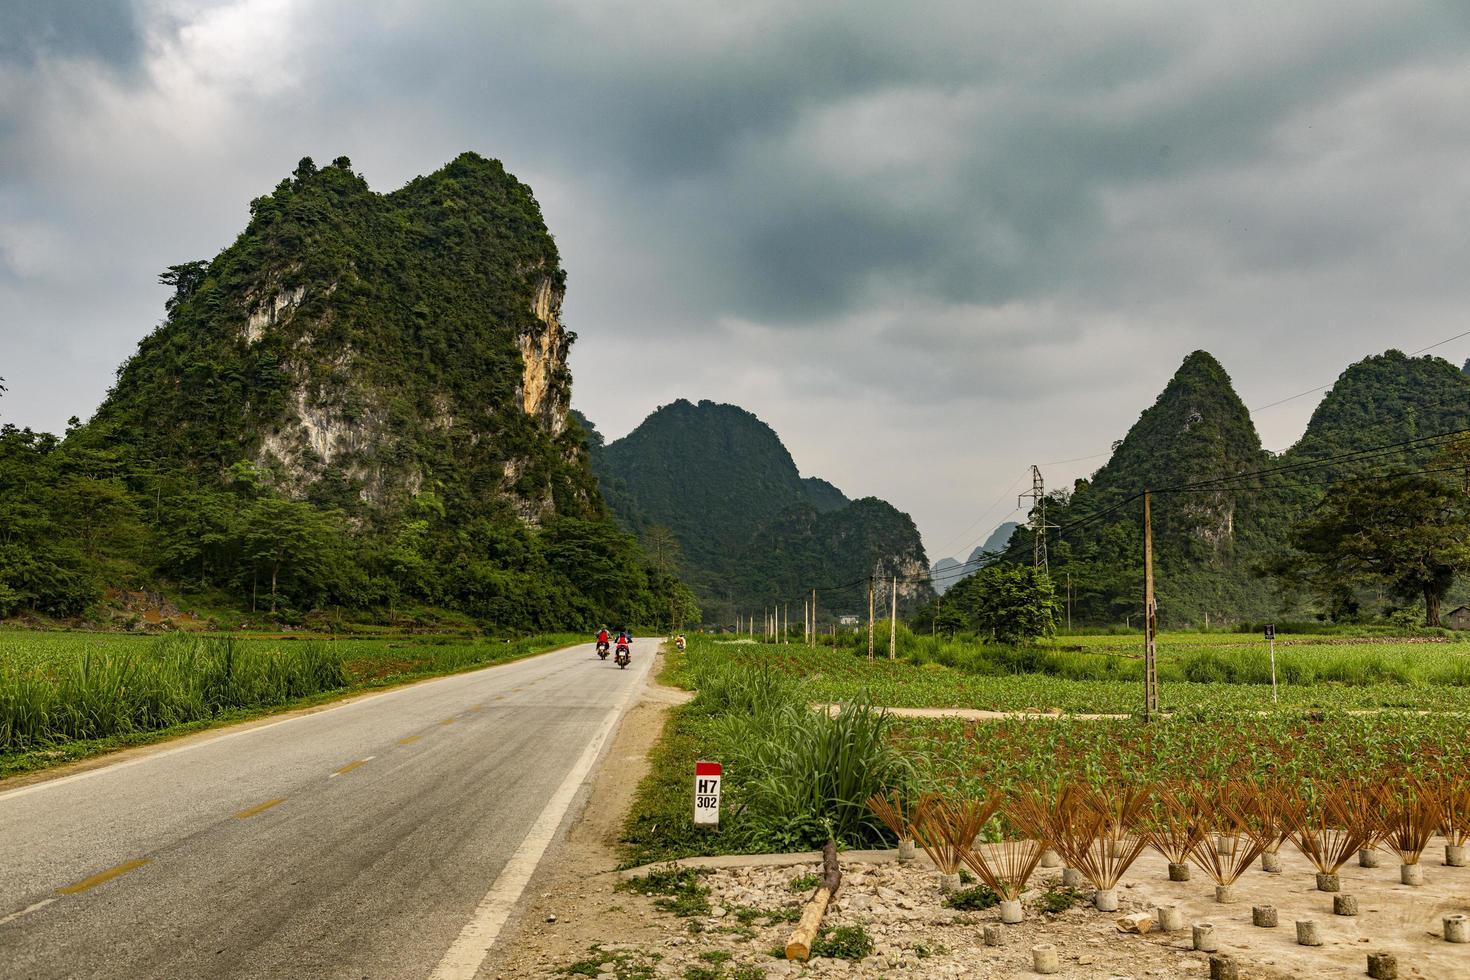 Vietnam, 2017-Rice field workers and family travel via motorbike photo